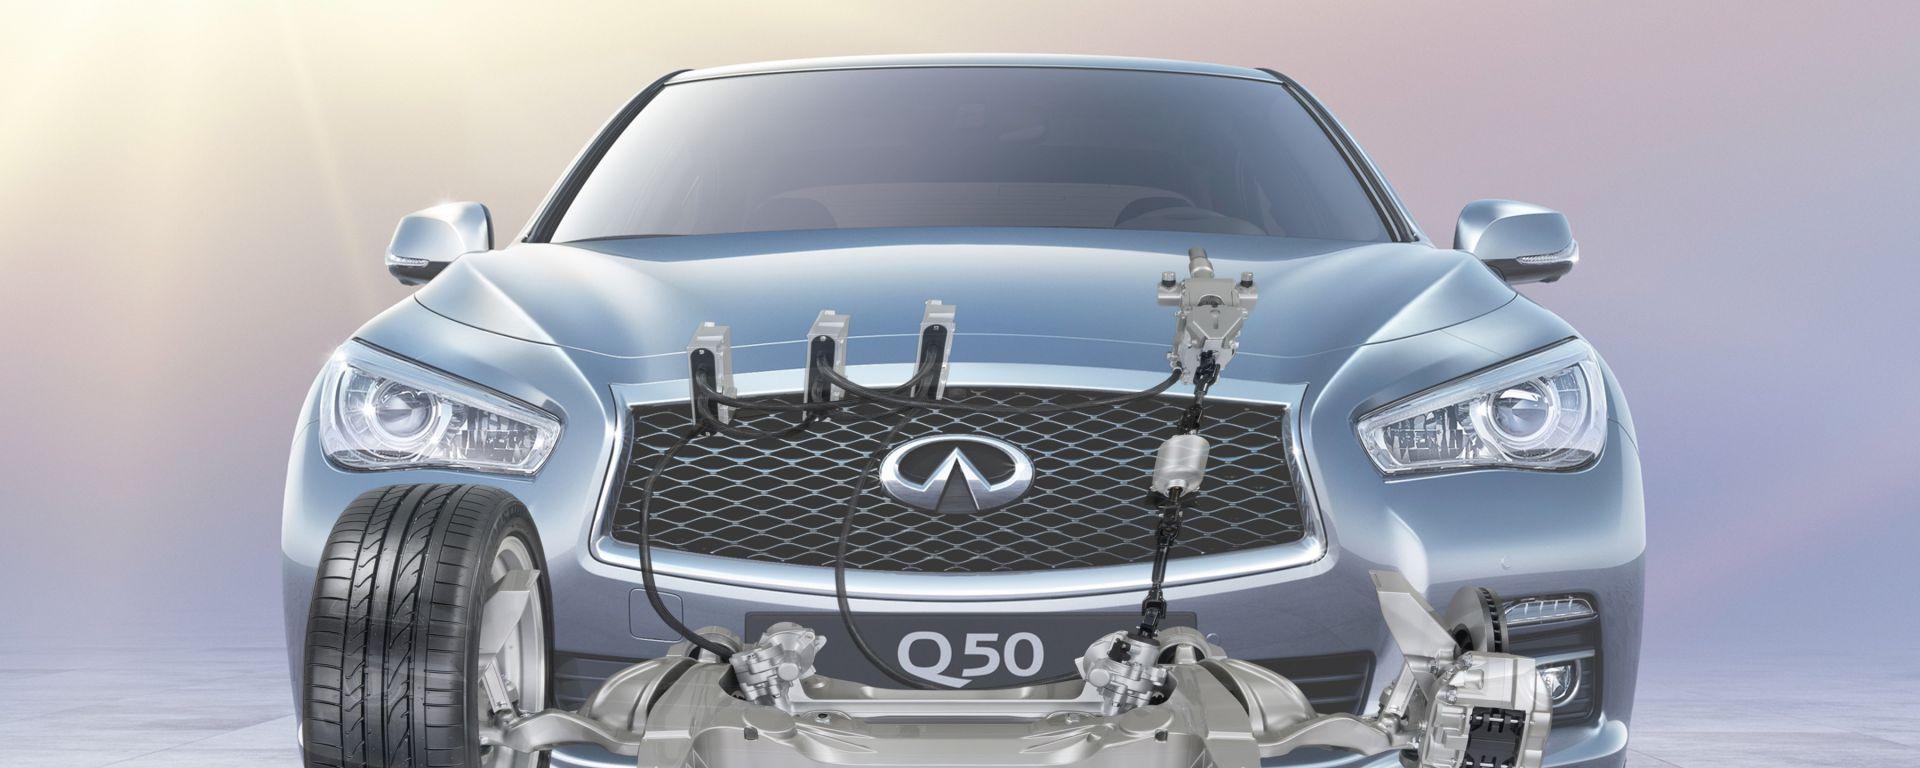 Infiniti Direct Adaptive Steering